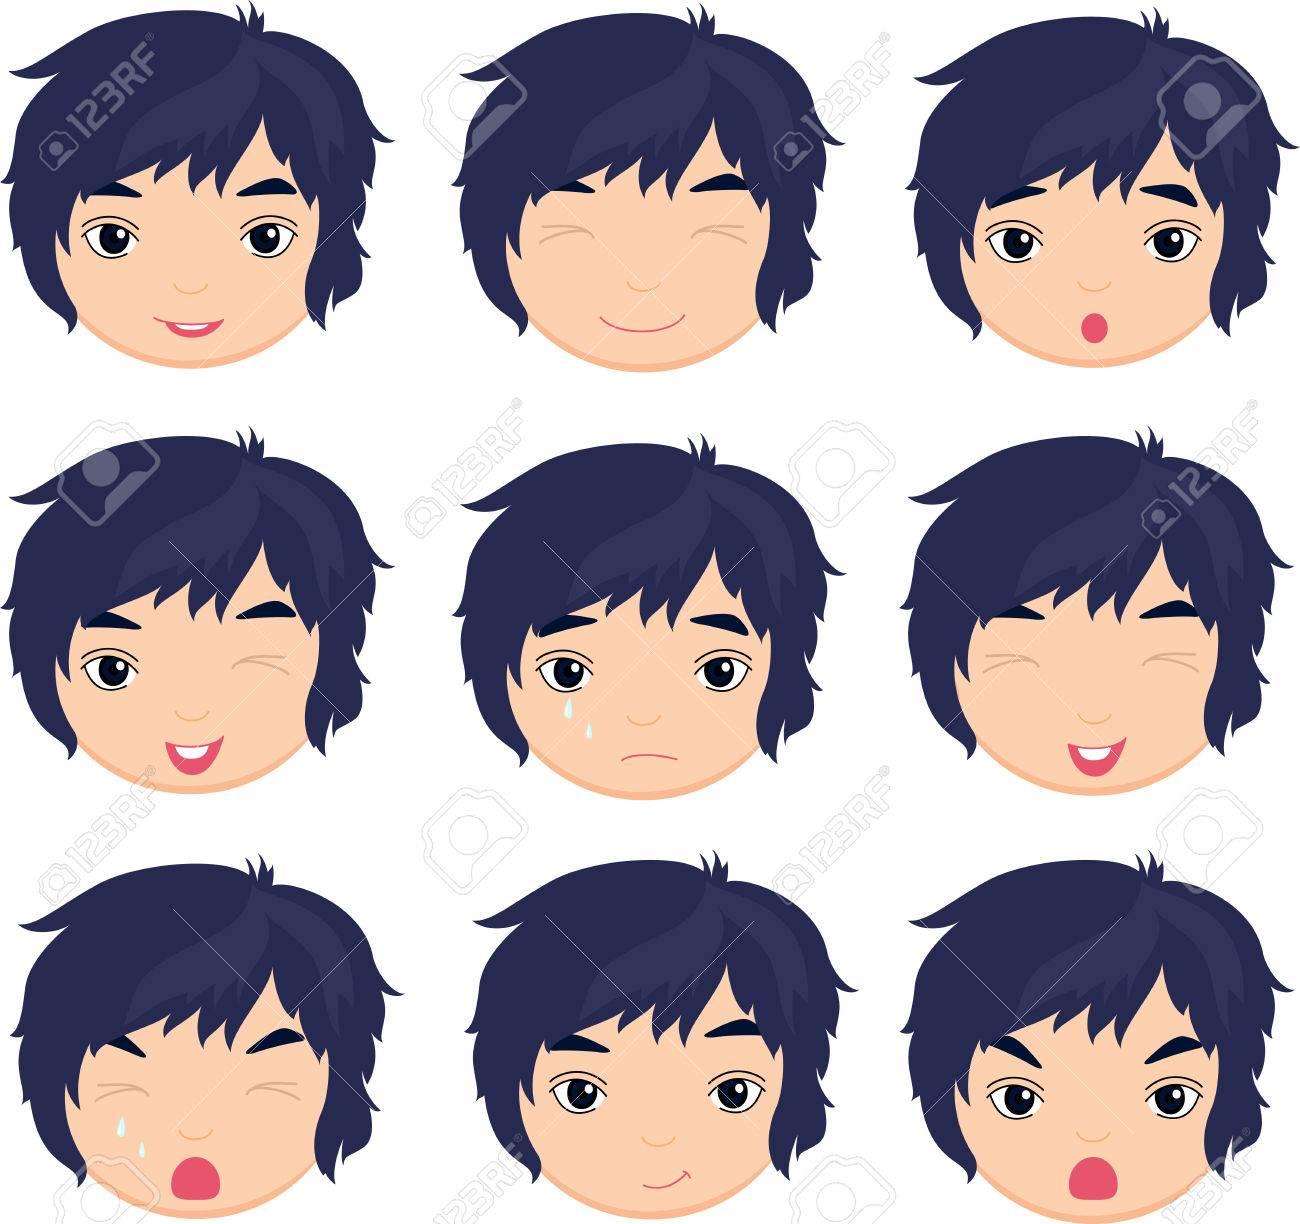 Anime Junge Emotion Freude Uberraschung Angst Trauer Weinen